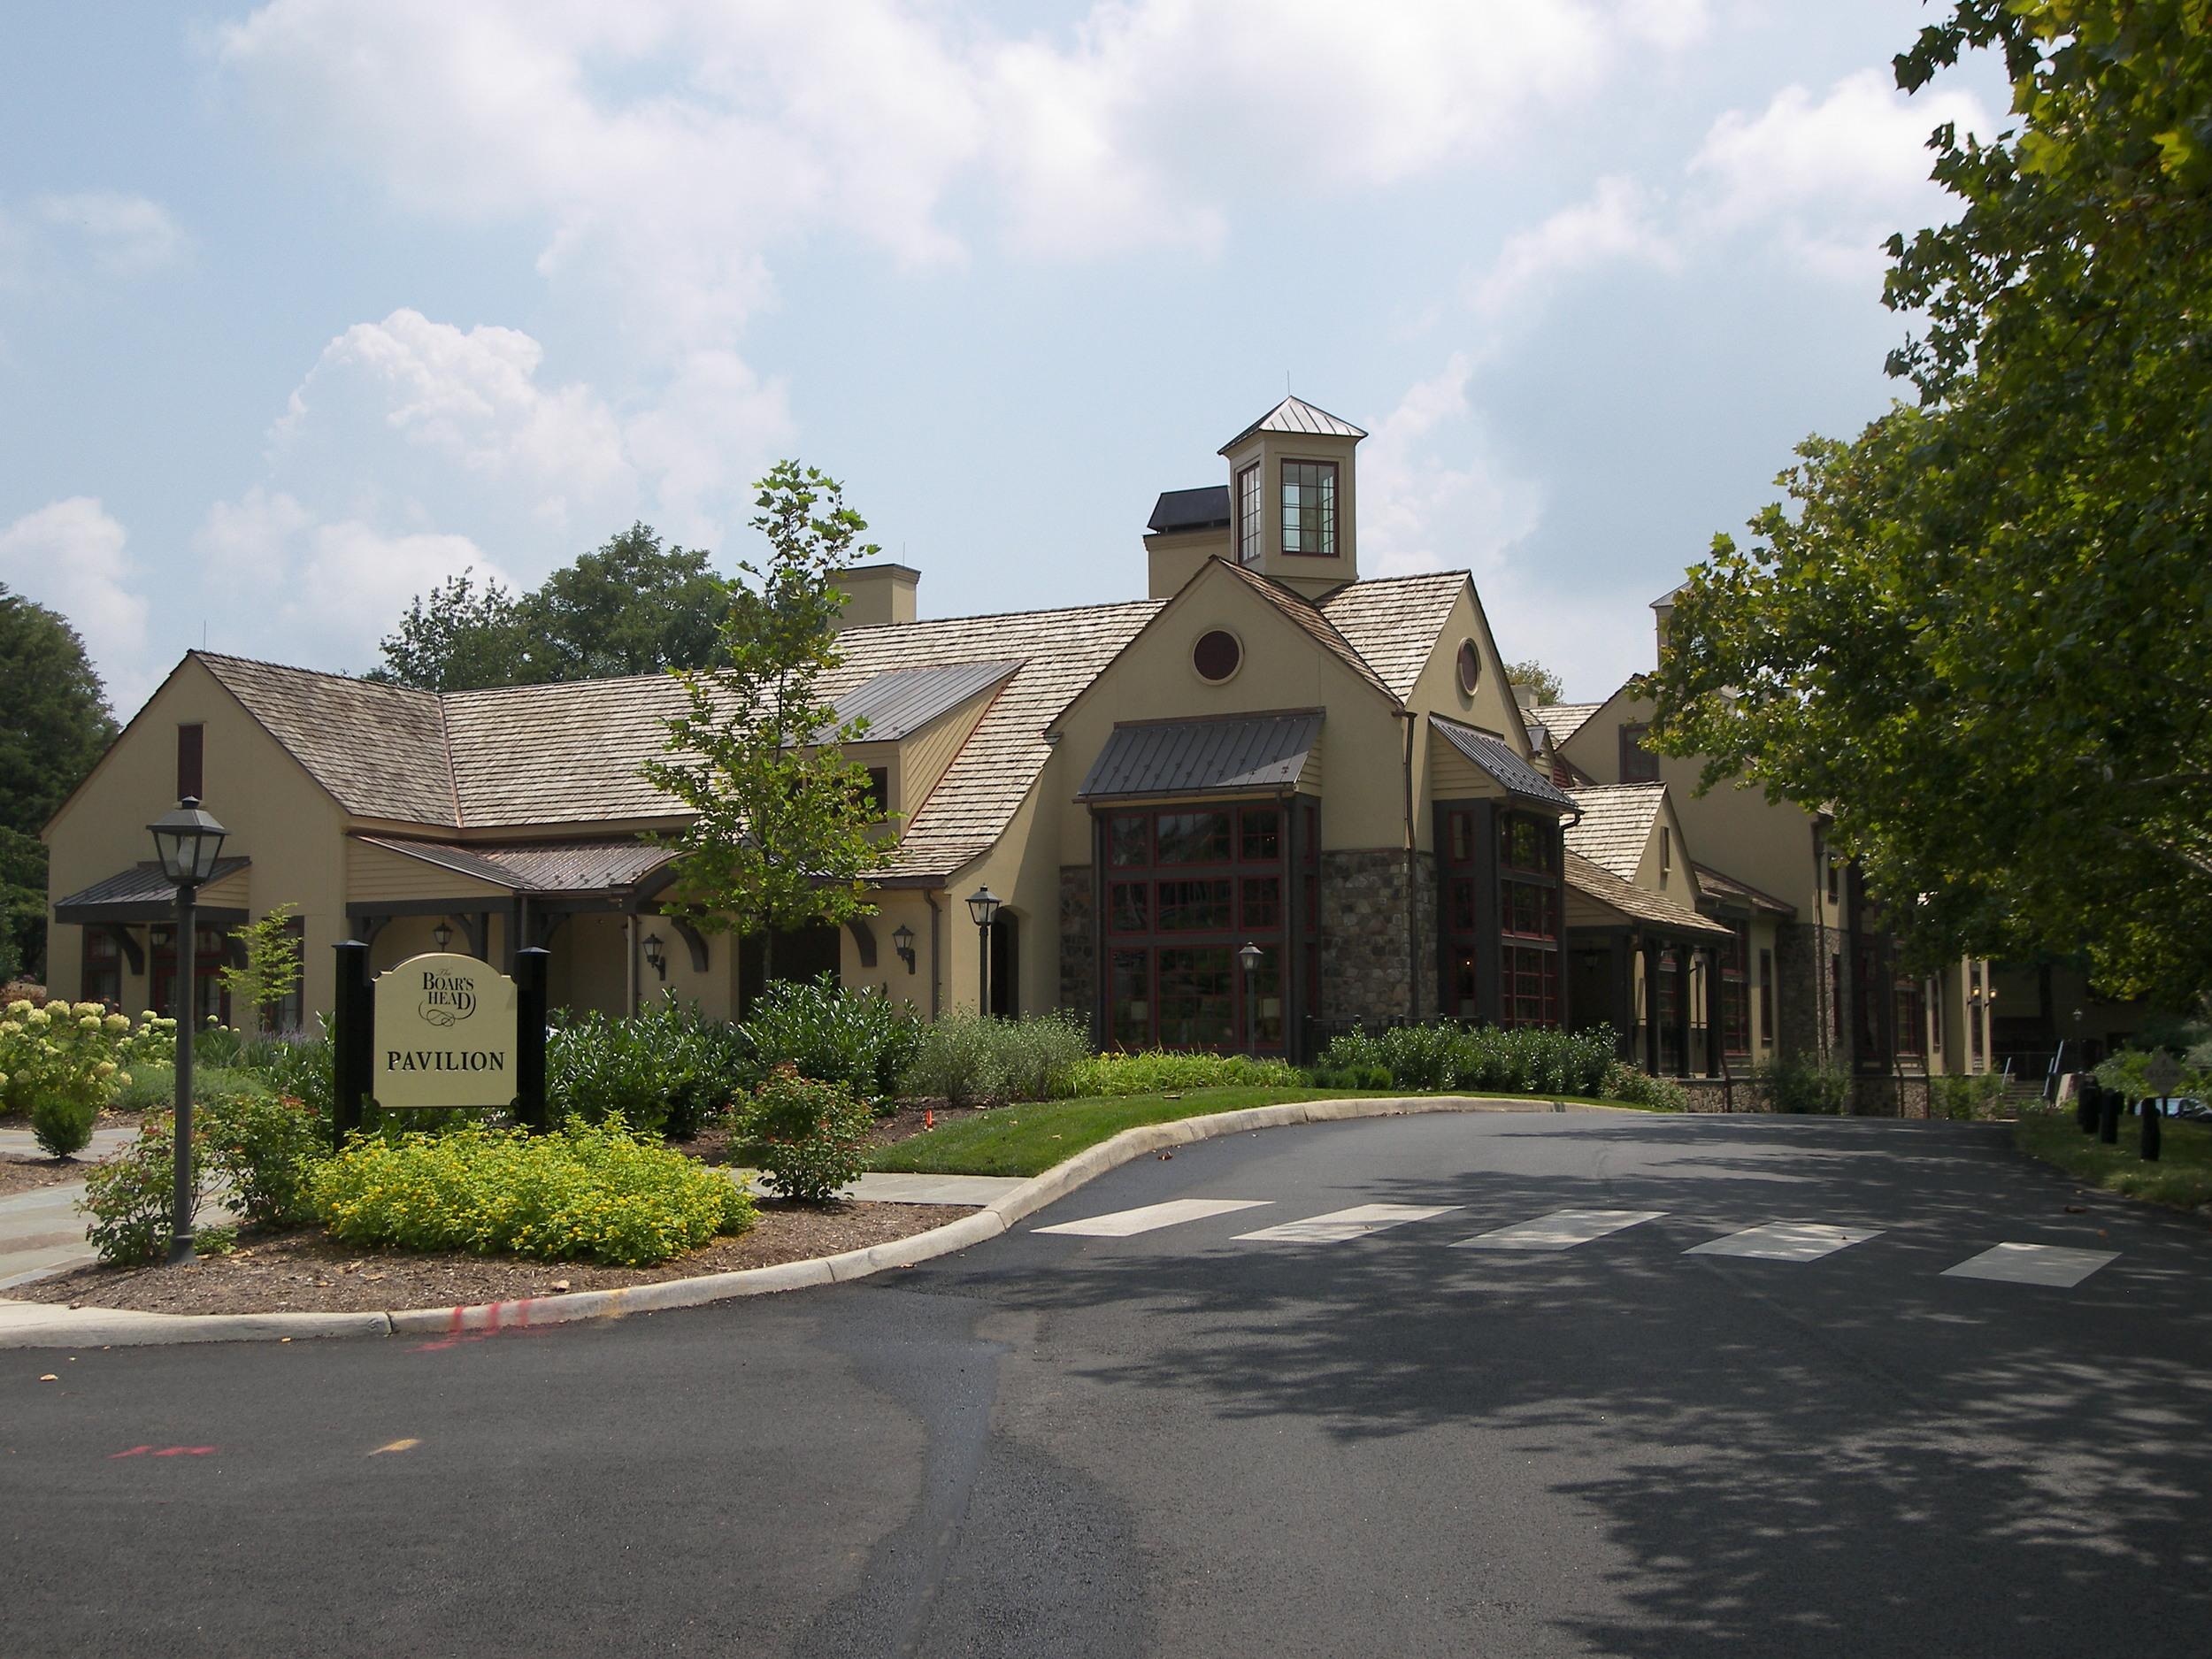 Boar's Head Inn Exterior